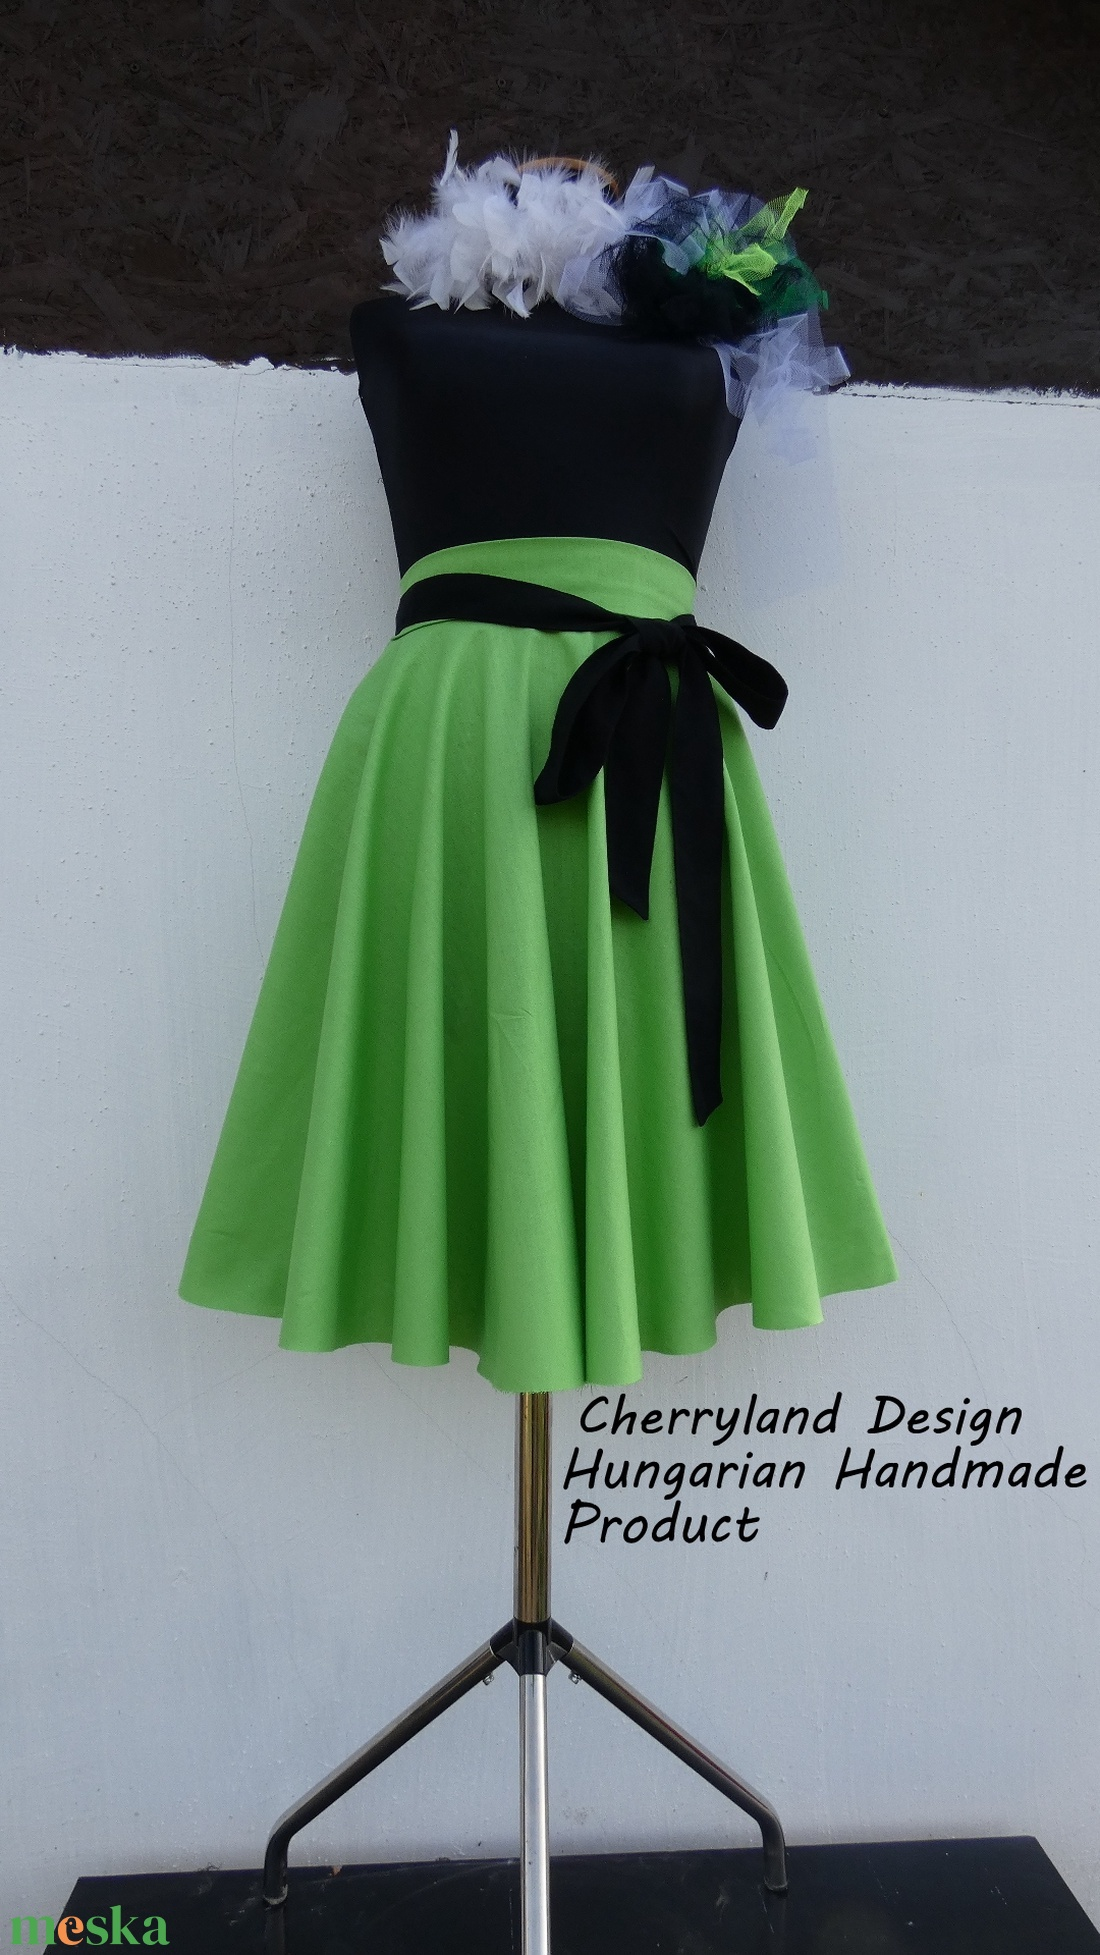 Cherryland Design Zöld  Rockabilly stílusú szoknya  - Meska.hu